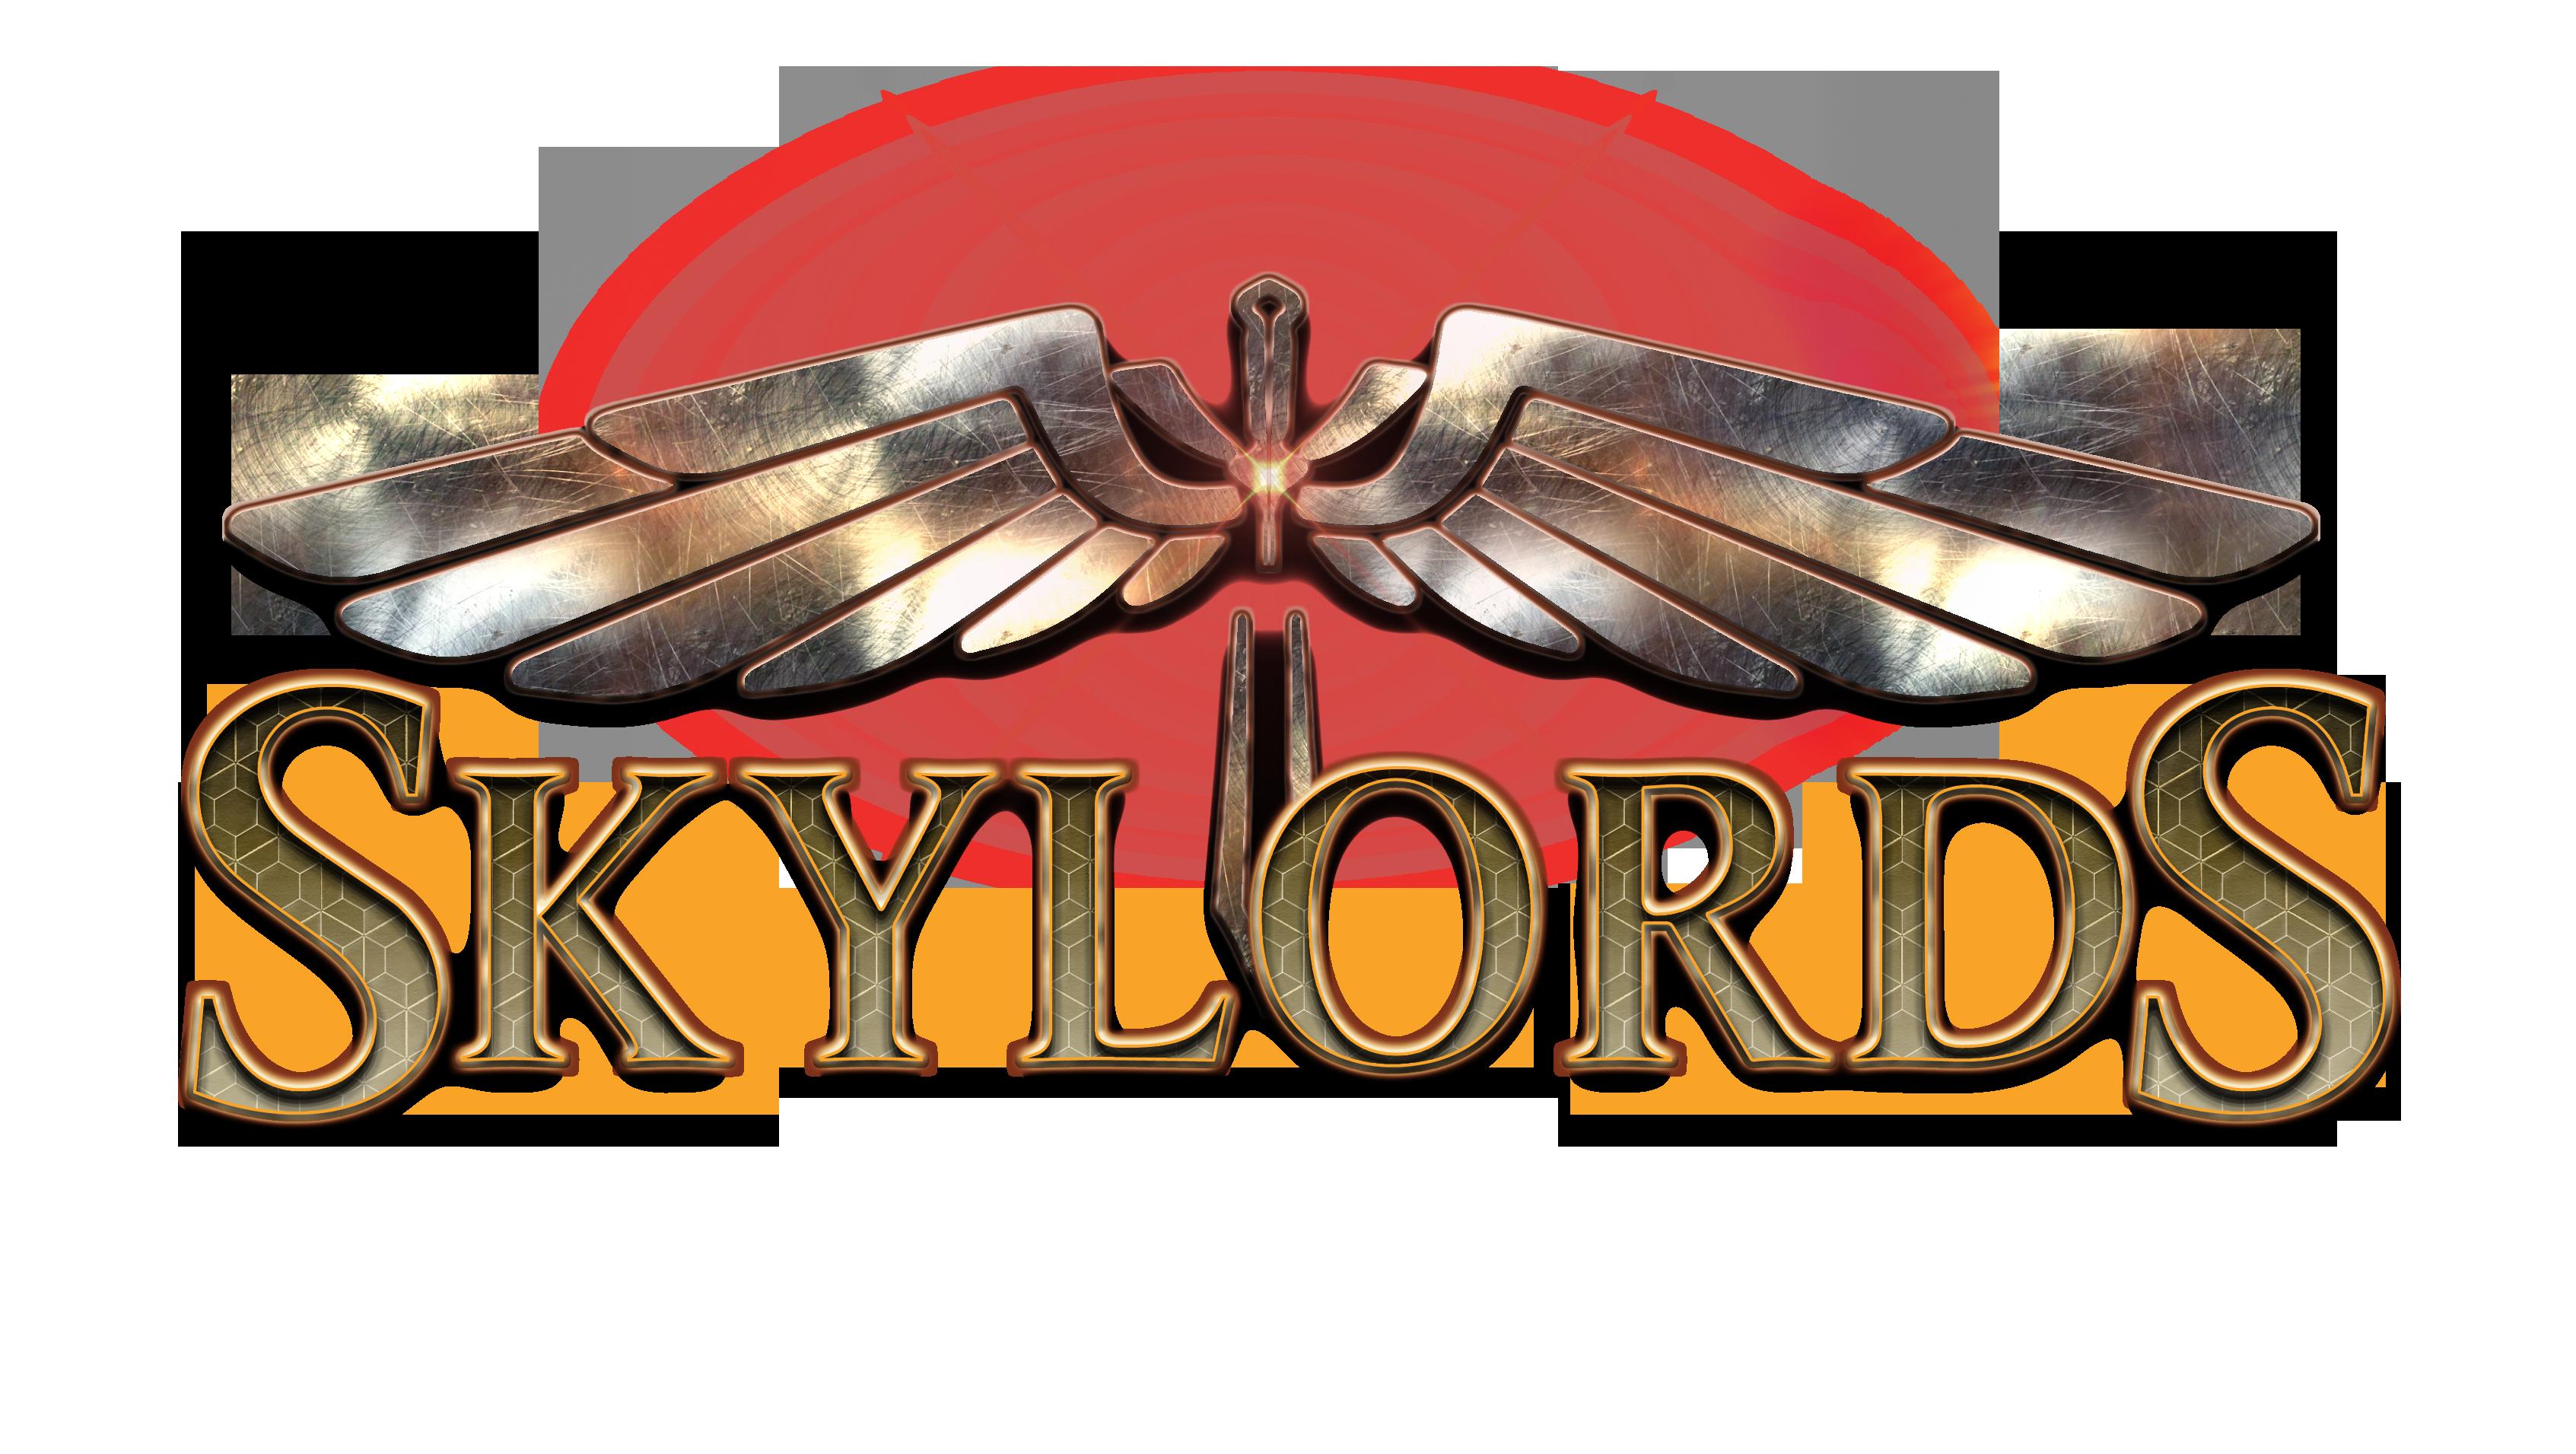 Skylords Reborn